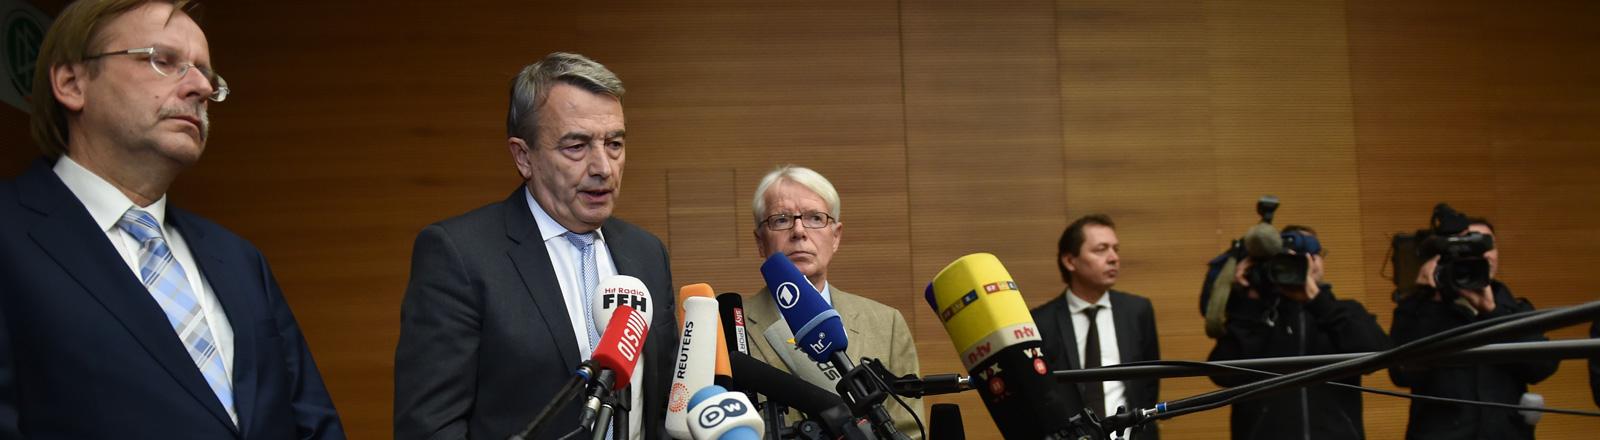 DFB-Präsident Wolfgang Niersbach (M) erklärt am 09.11.2015 im Anschluss an die Präsidiumssitzung des Deutschen Fußball-Bundes (DFB) in Frankfurt am Main (Hessen) neben den DFB-Vizepräsidenten Rainer Koch (l) und Reinhard Rauball seinen Rücktritt.